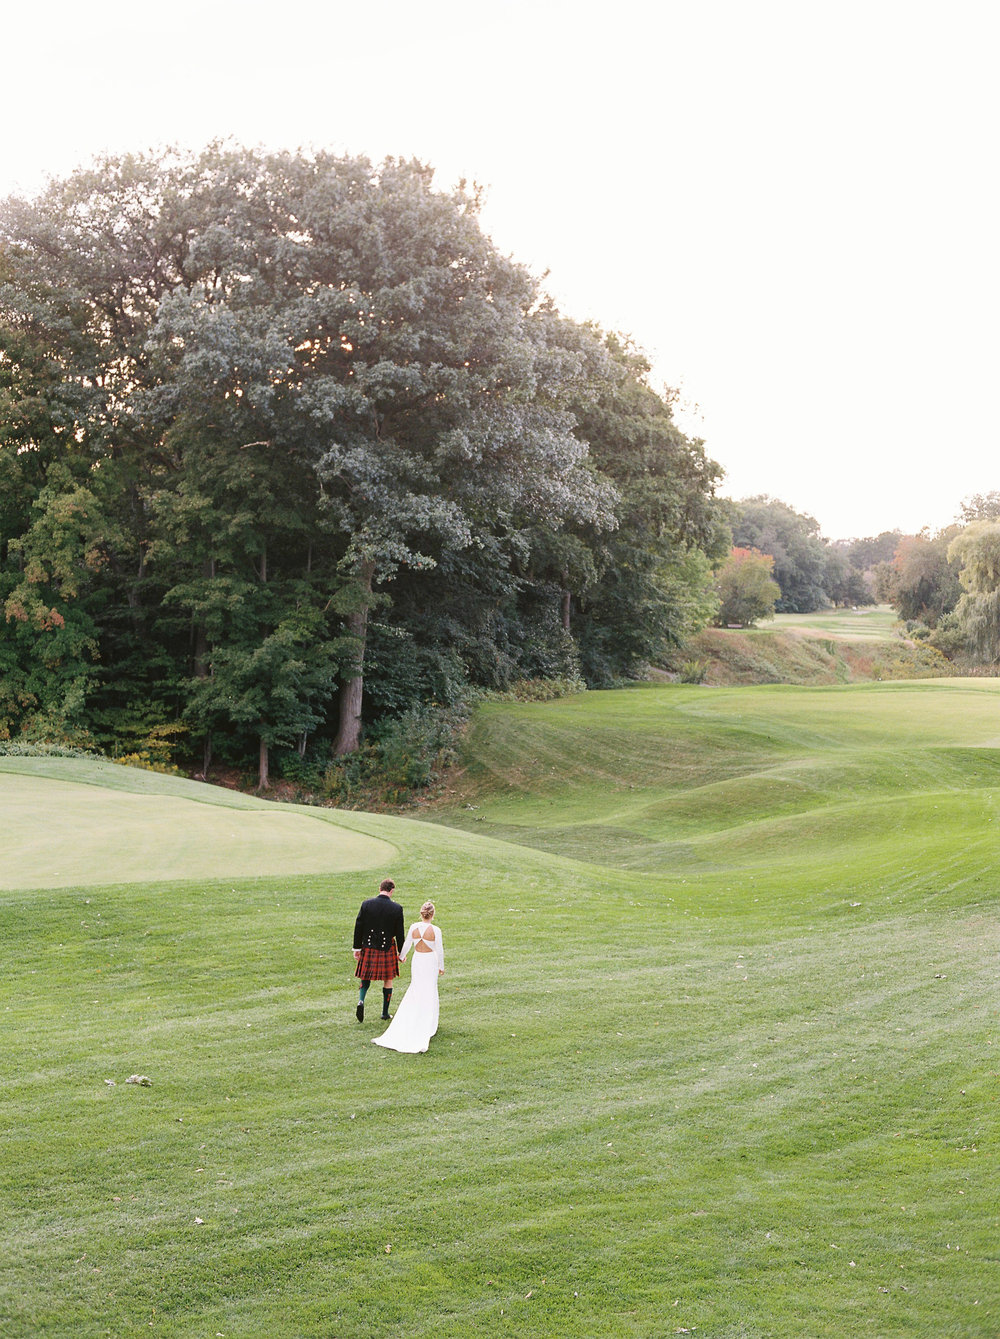 0568-Geneva-Ian-Wedding-Toronto Golf Club-When He Found Her-TorontoPhotographer.jpg